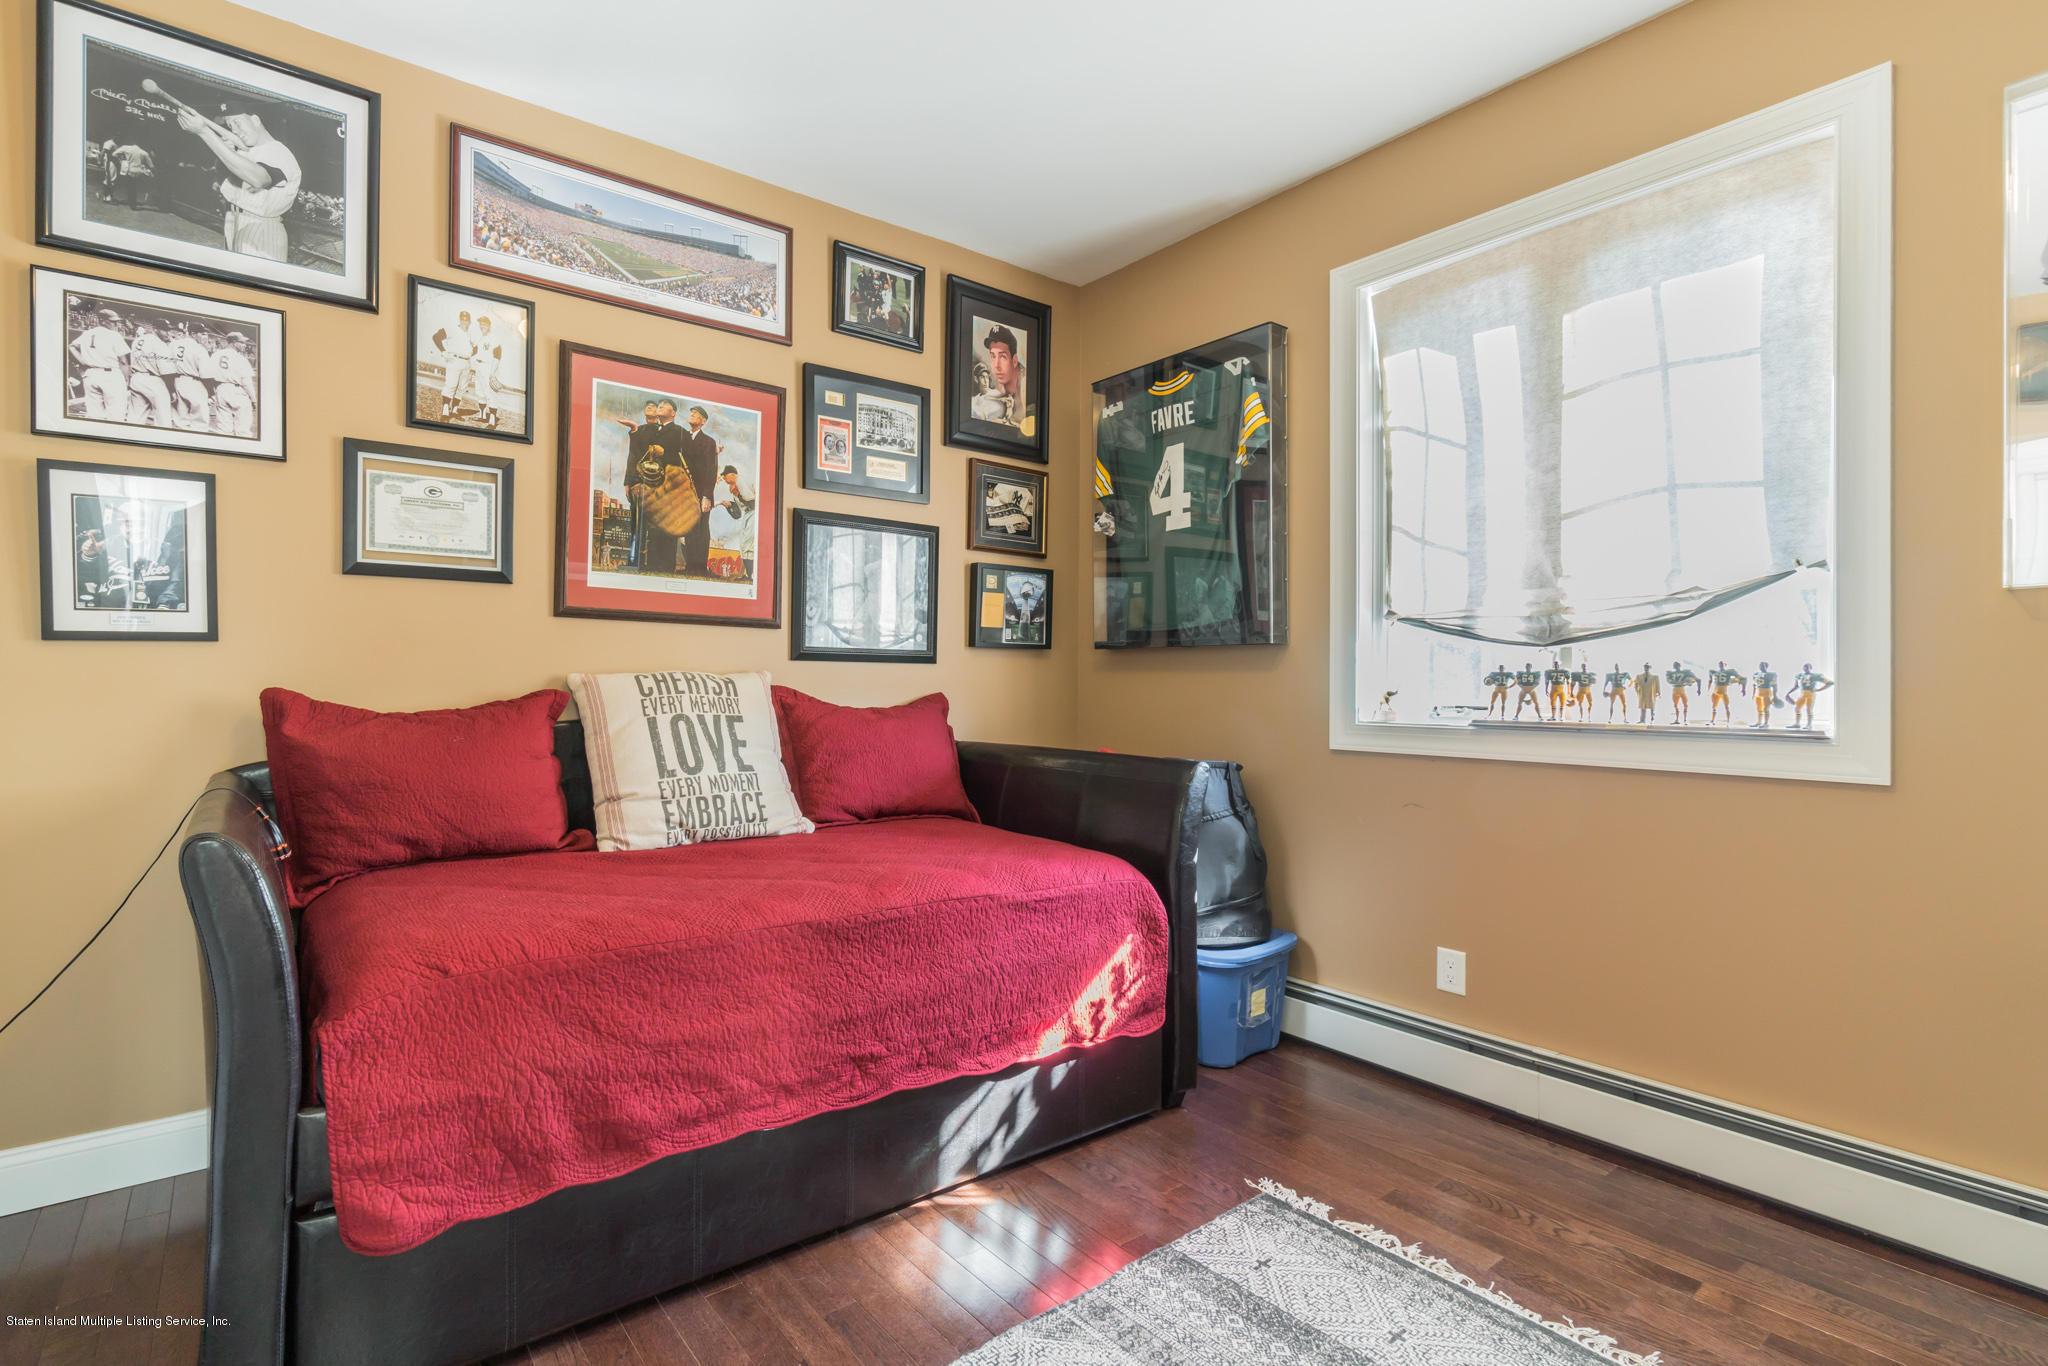 Single Family - Detached 41 Arbutus Way  Staten Island, NY 10312, MLS-1124255-16